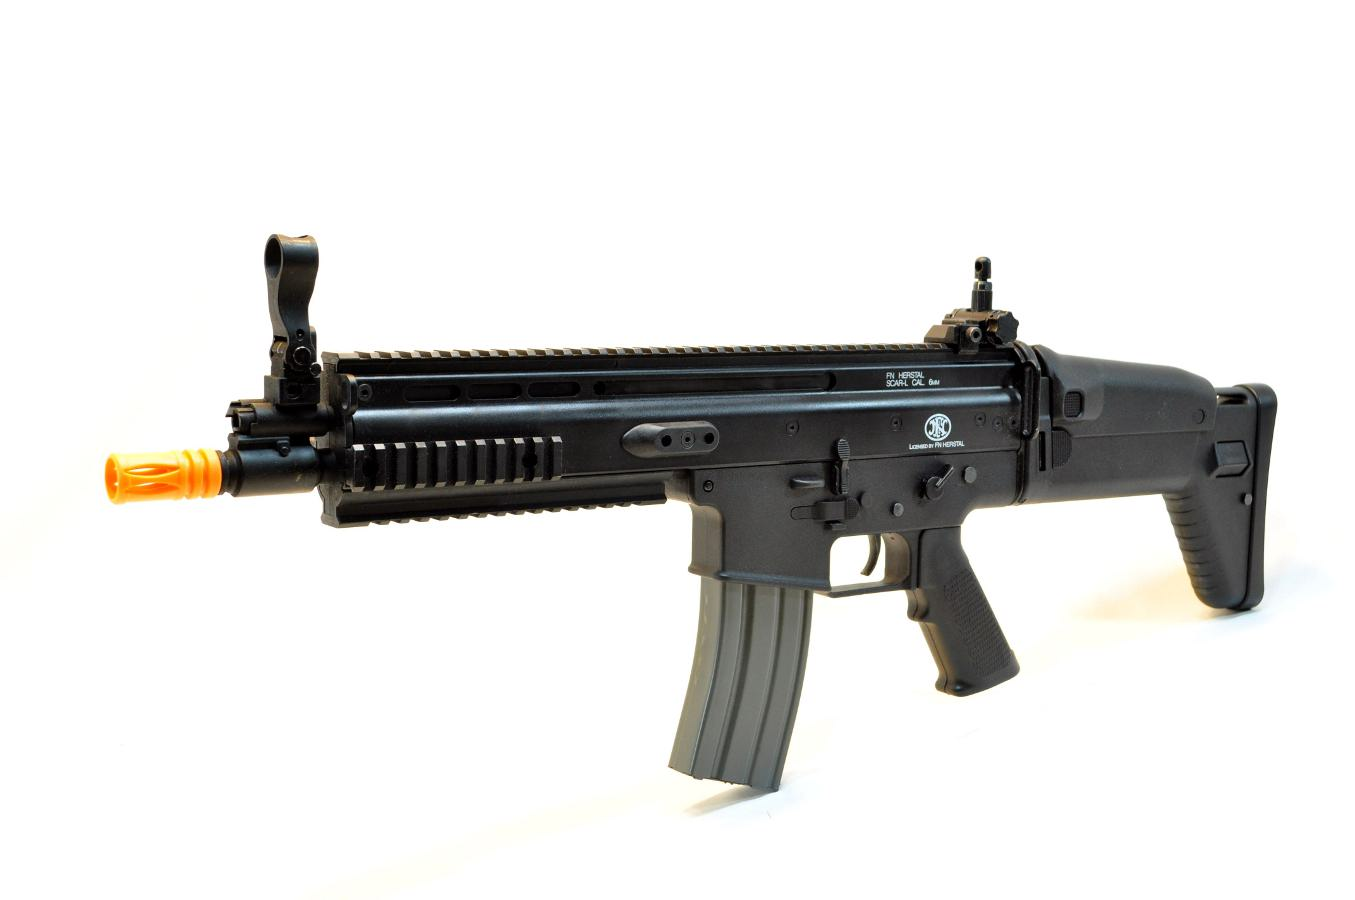 Classic Army Fn Herstal Scar L Sportline Airsoft Gun